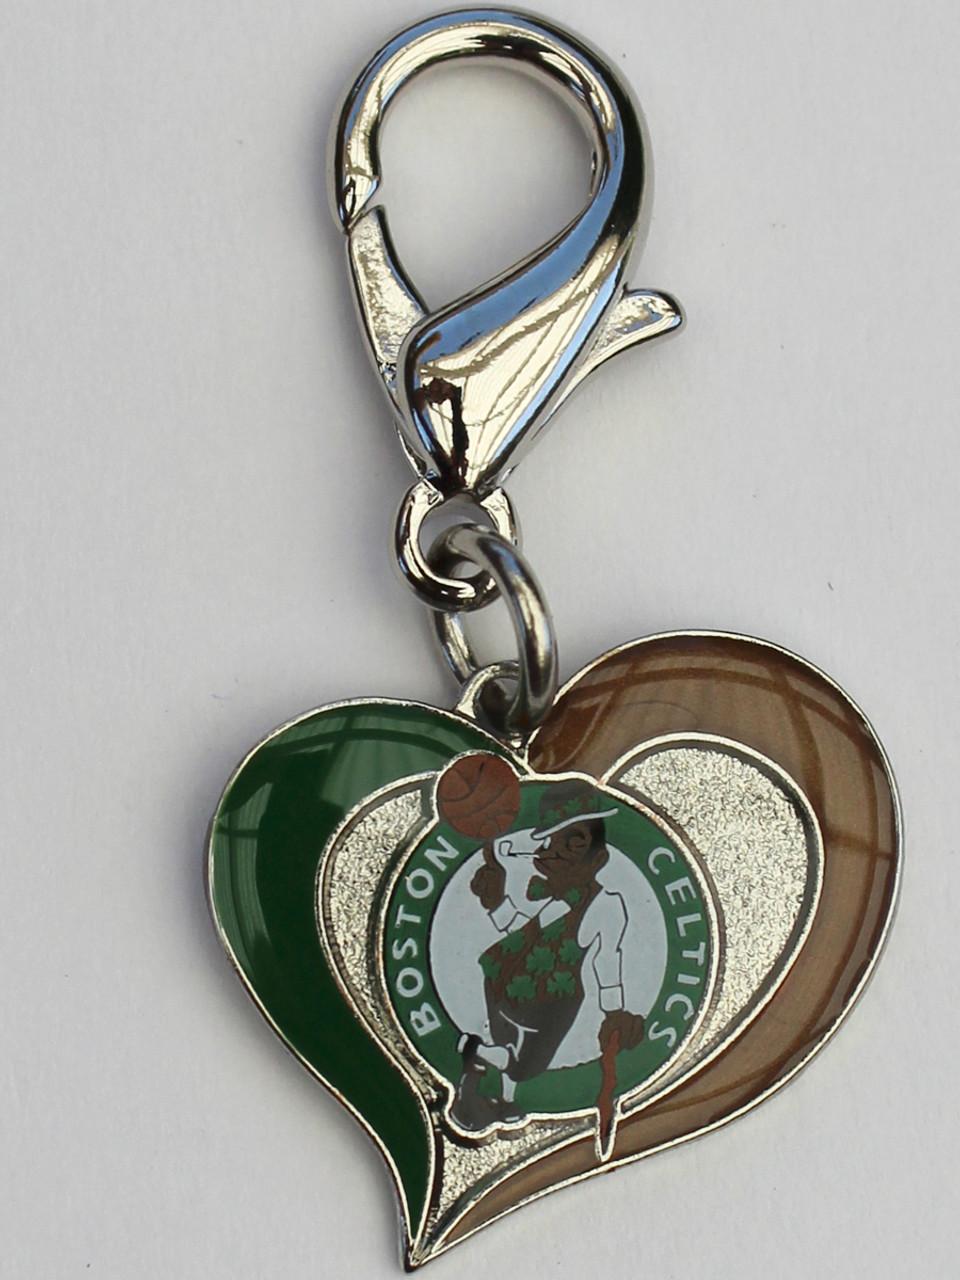 e207309a Boston Celtics Swirl Heart dog collar Charm - by Diva-Dog.com